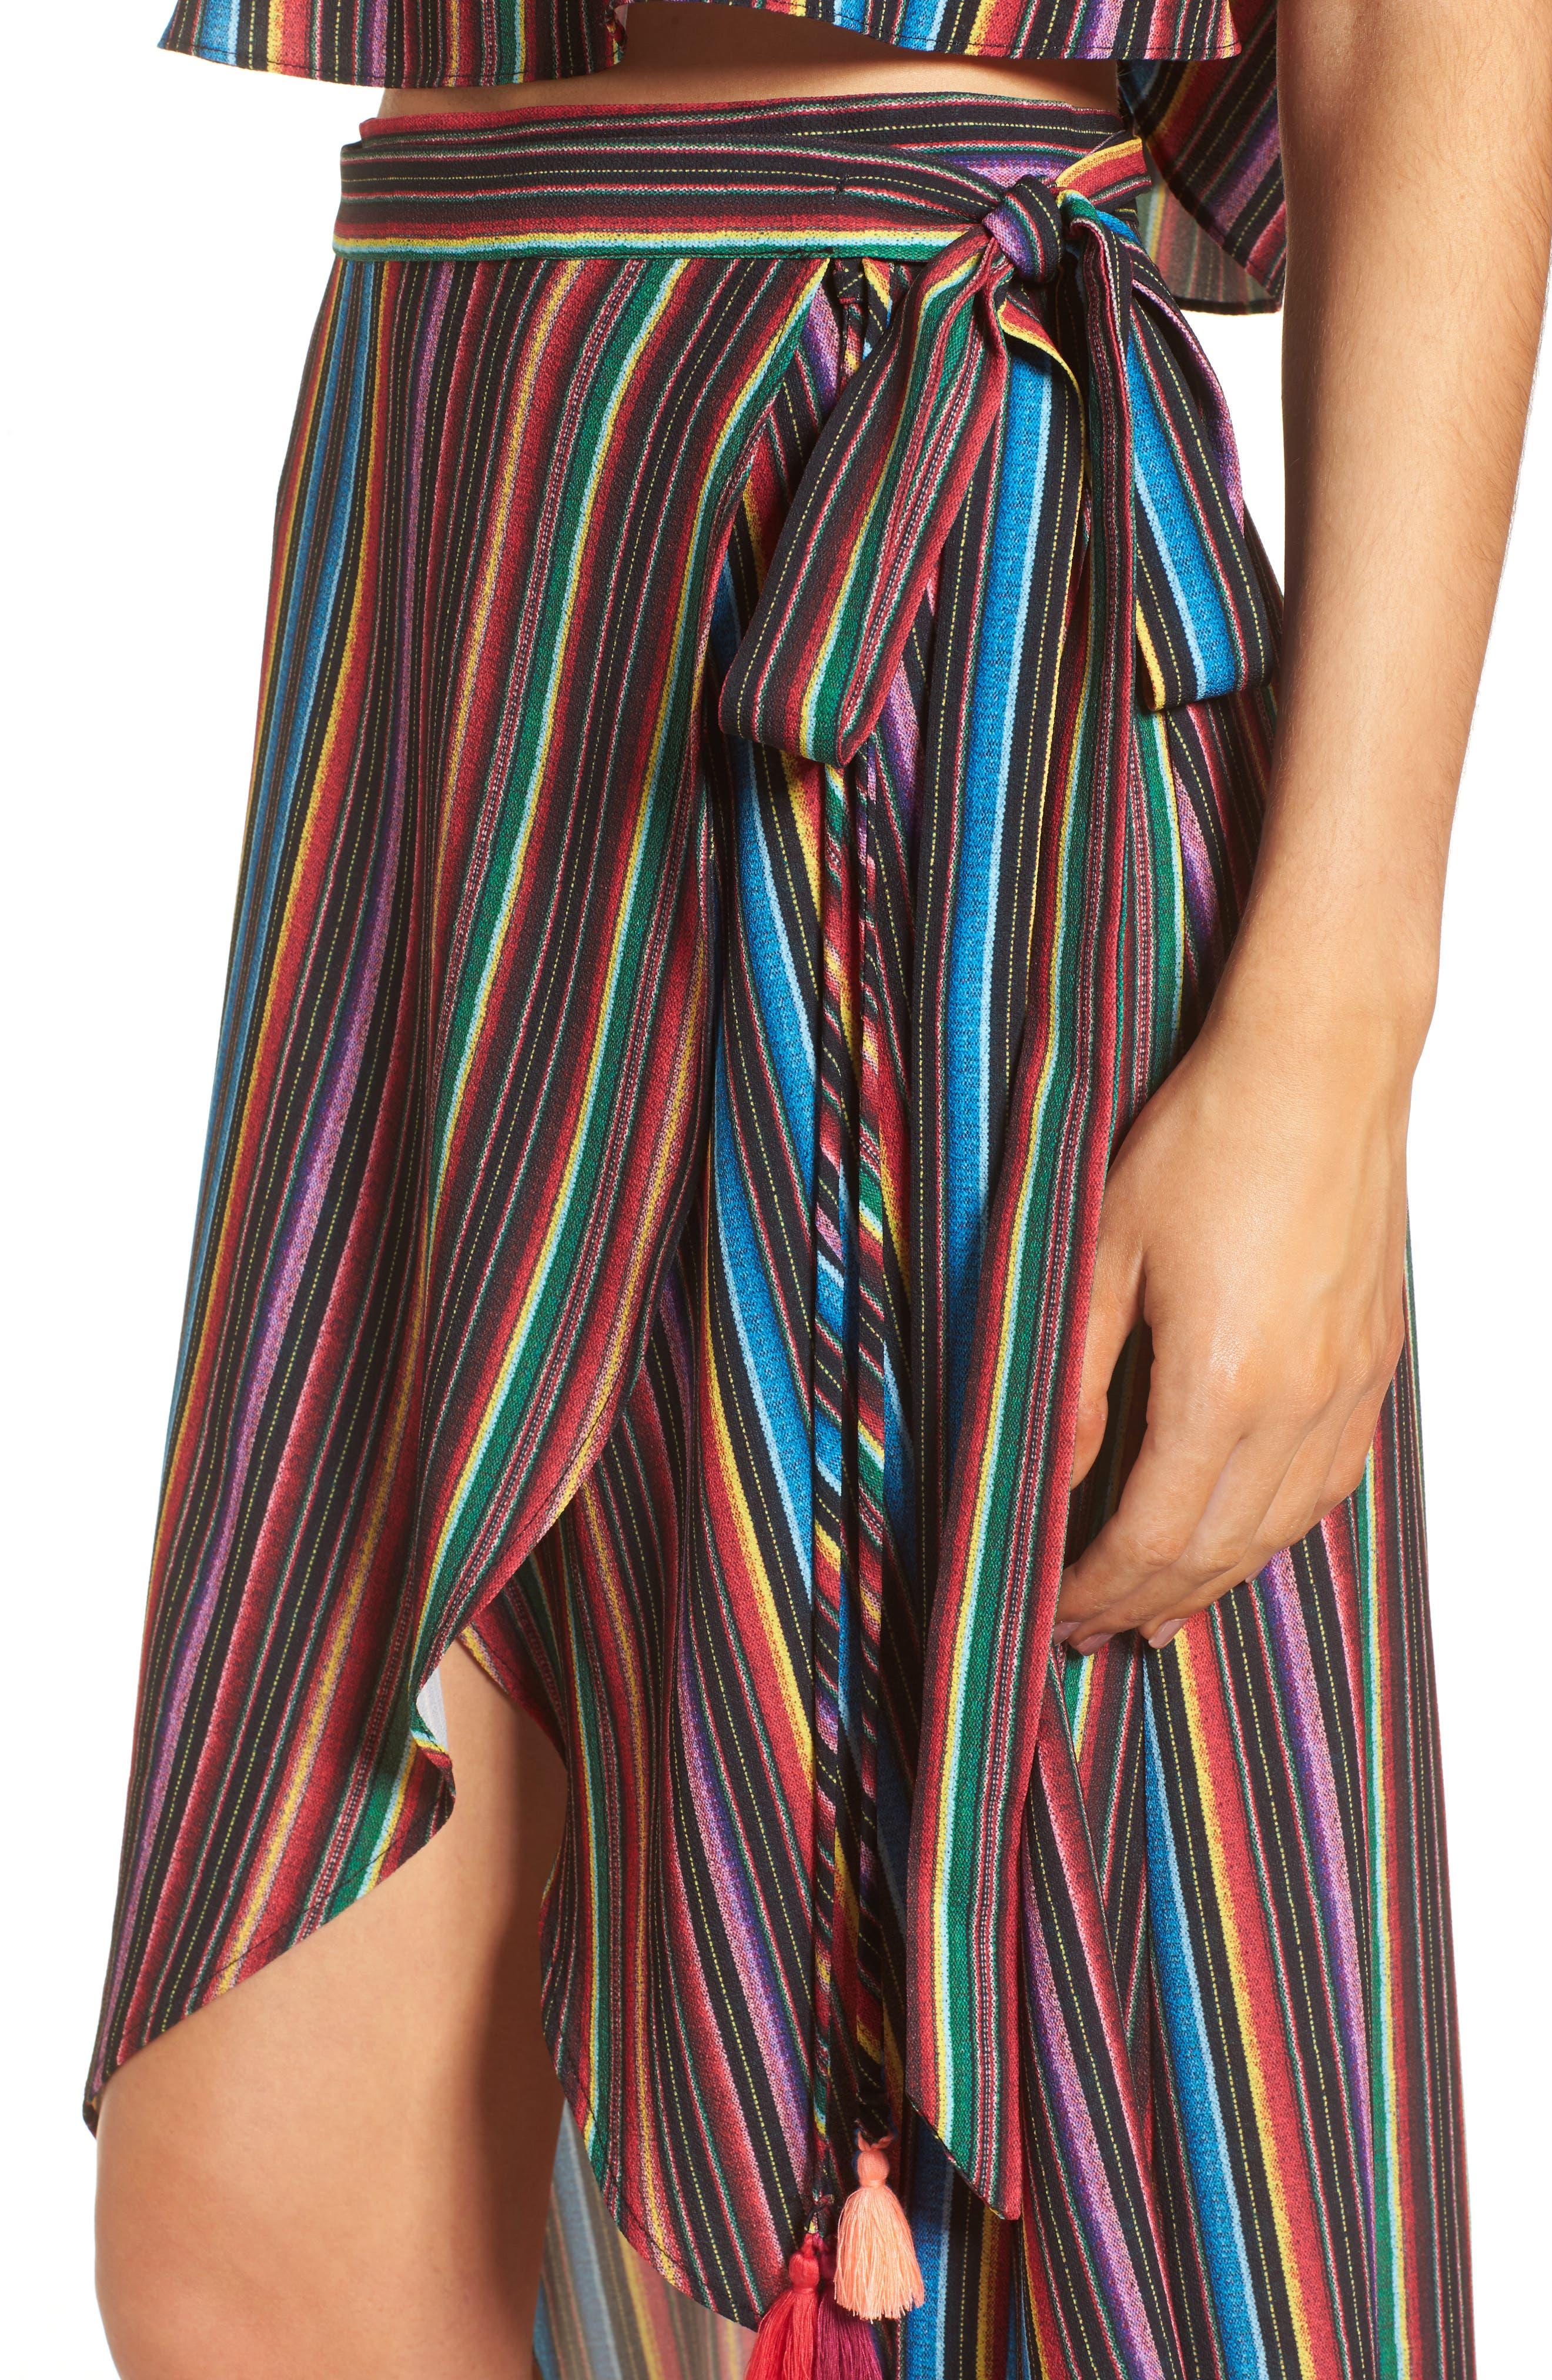 Panama Tassel Wrap Skirt,                             Alternate thumbnail 4, color,                             001